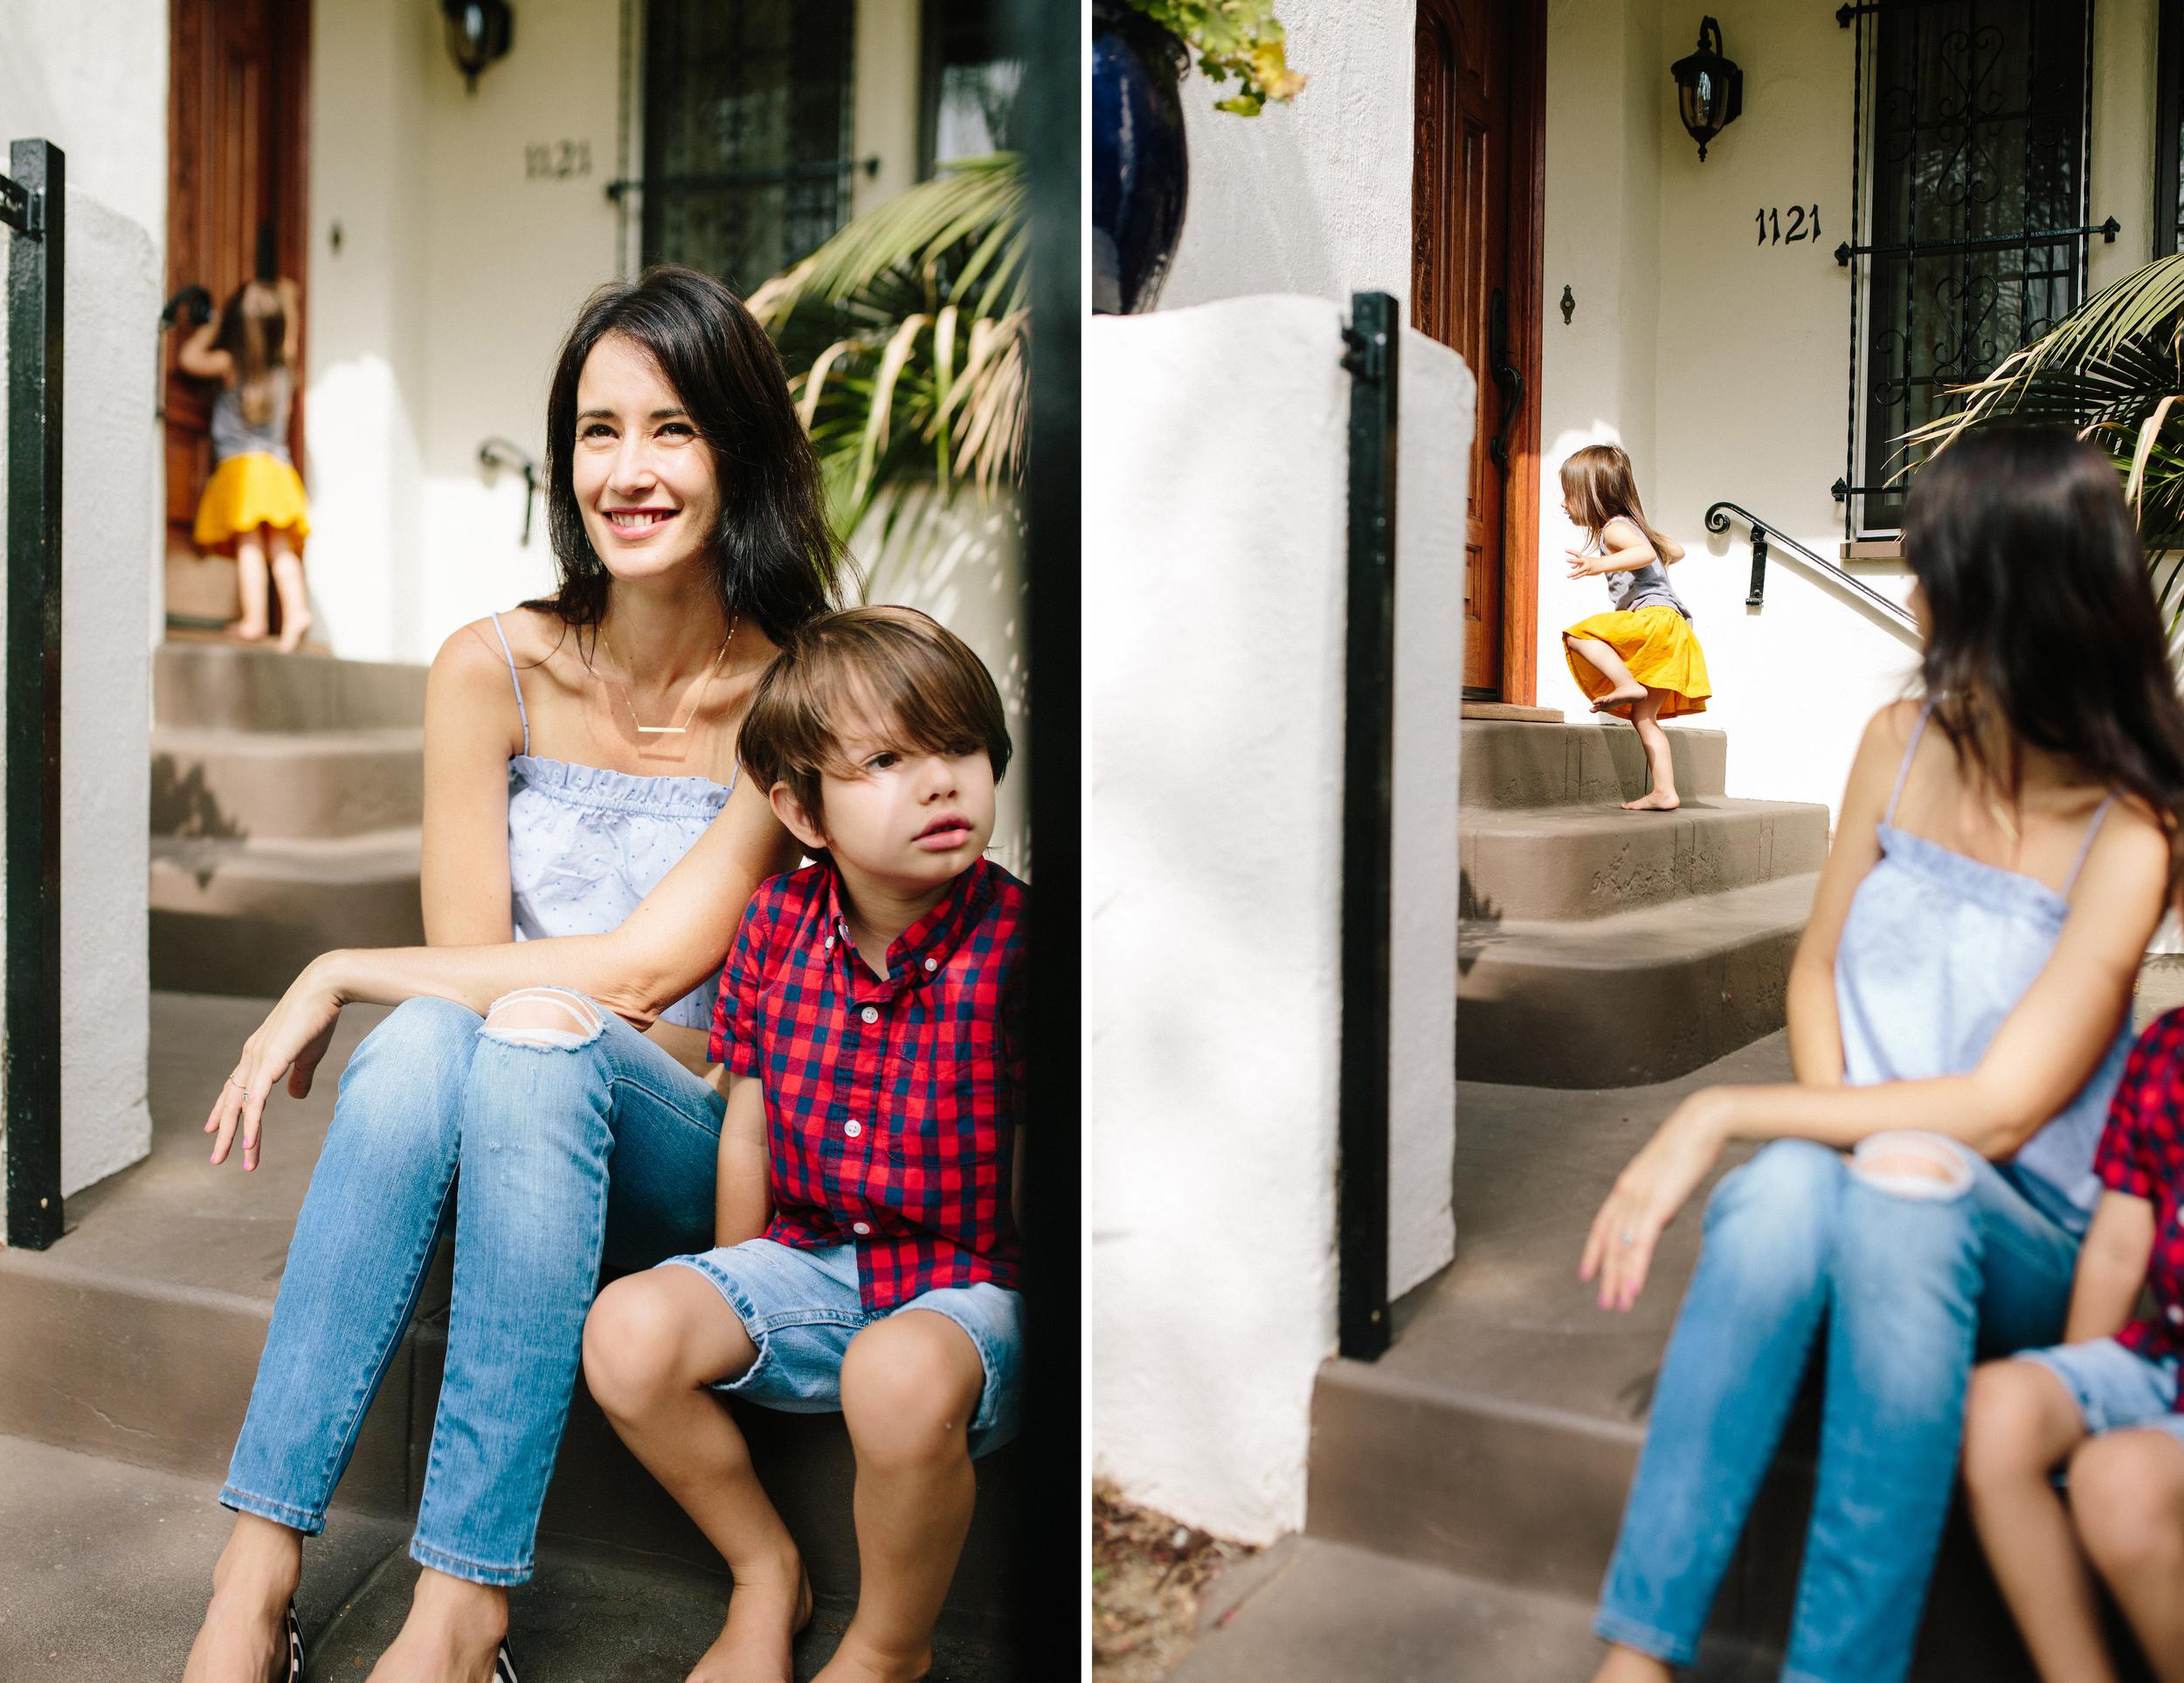 los-angeles-lifestyle-family-child-kid-baby-photographer_4.jpg